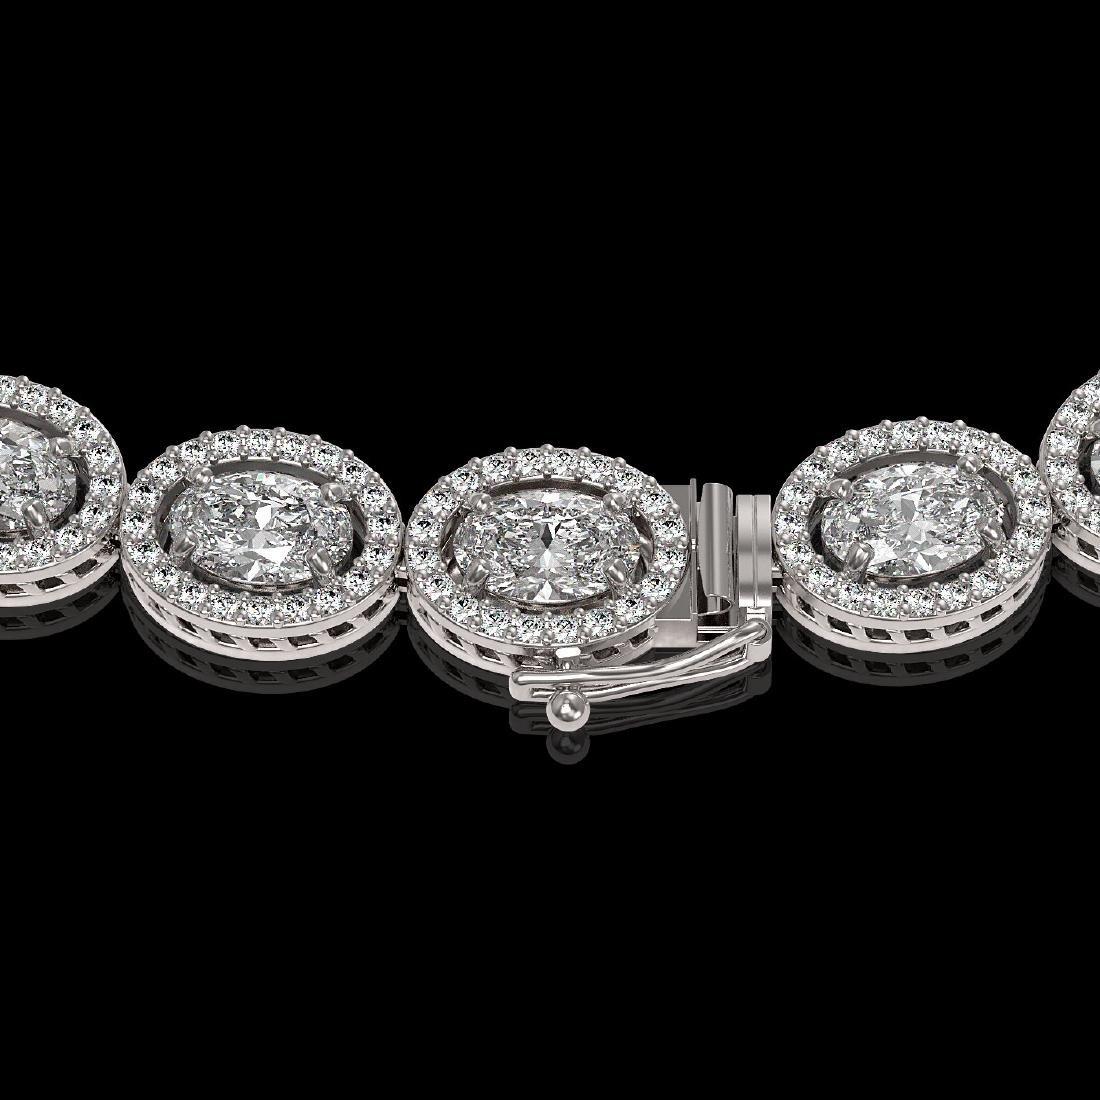 30.41 CTW Oval Diamond Designer Necklace 18K White Gold - 3